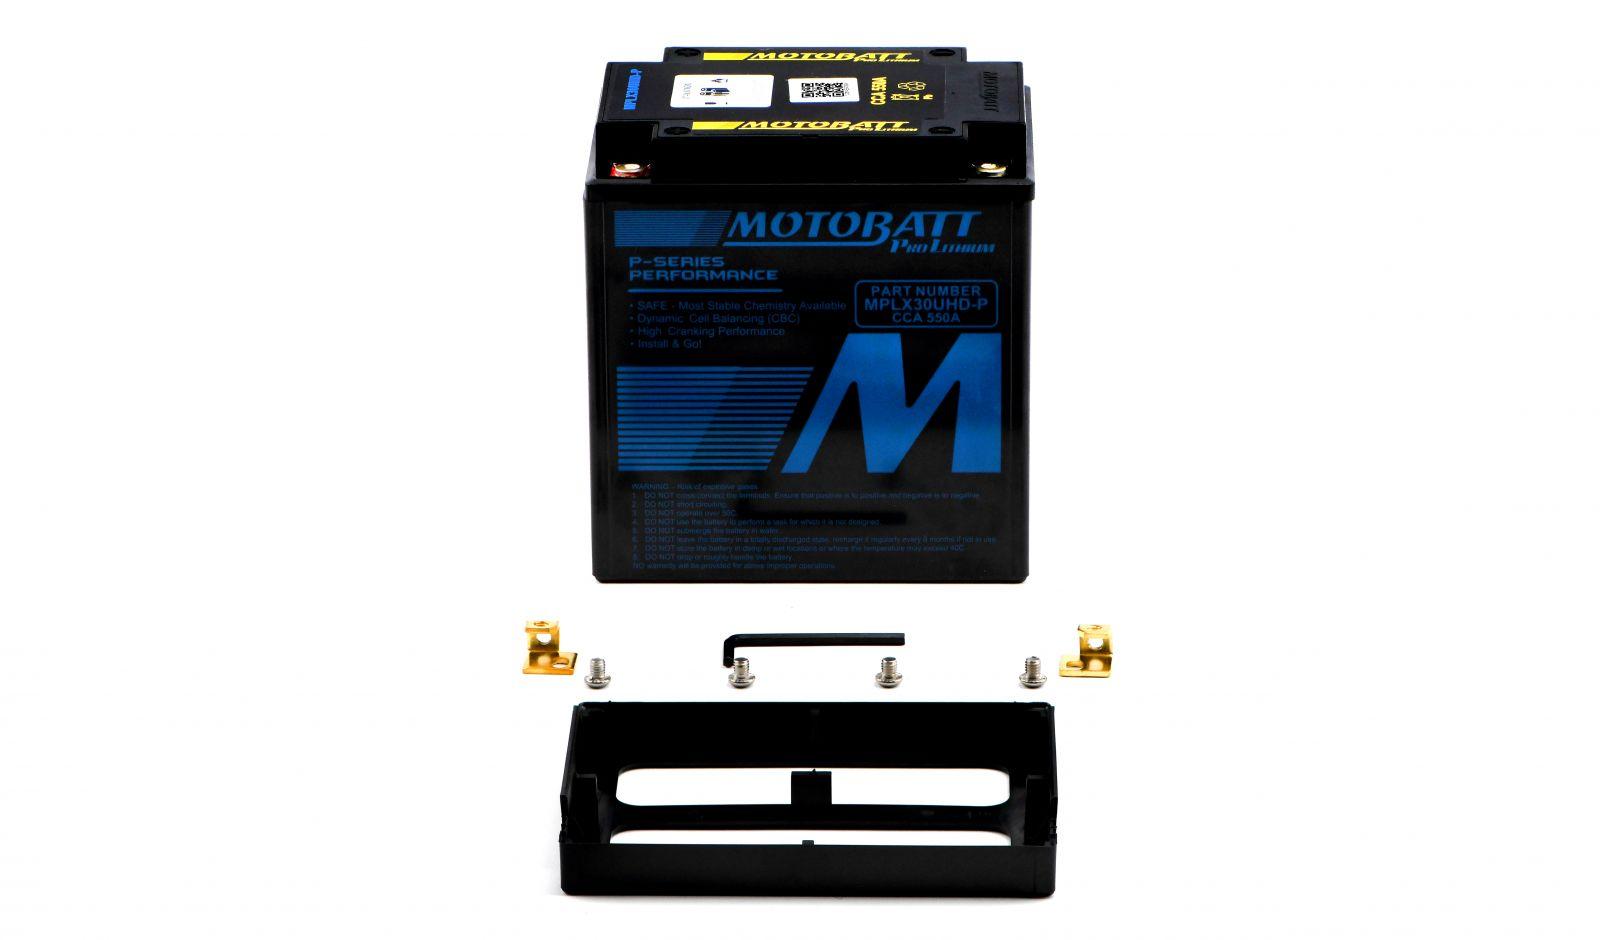 Motobatt Lithium Batteries - 501305ML image